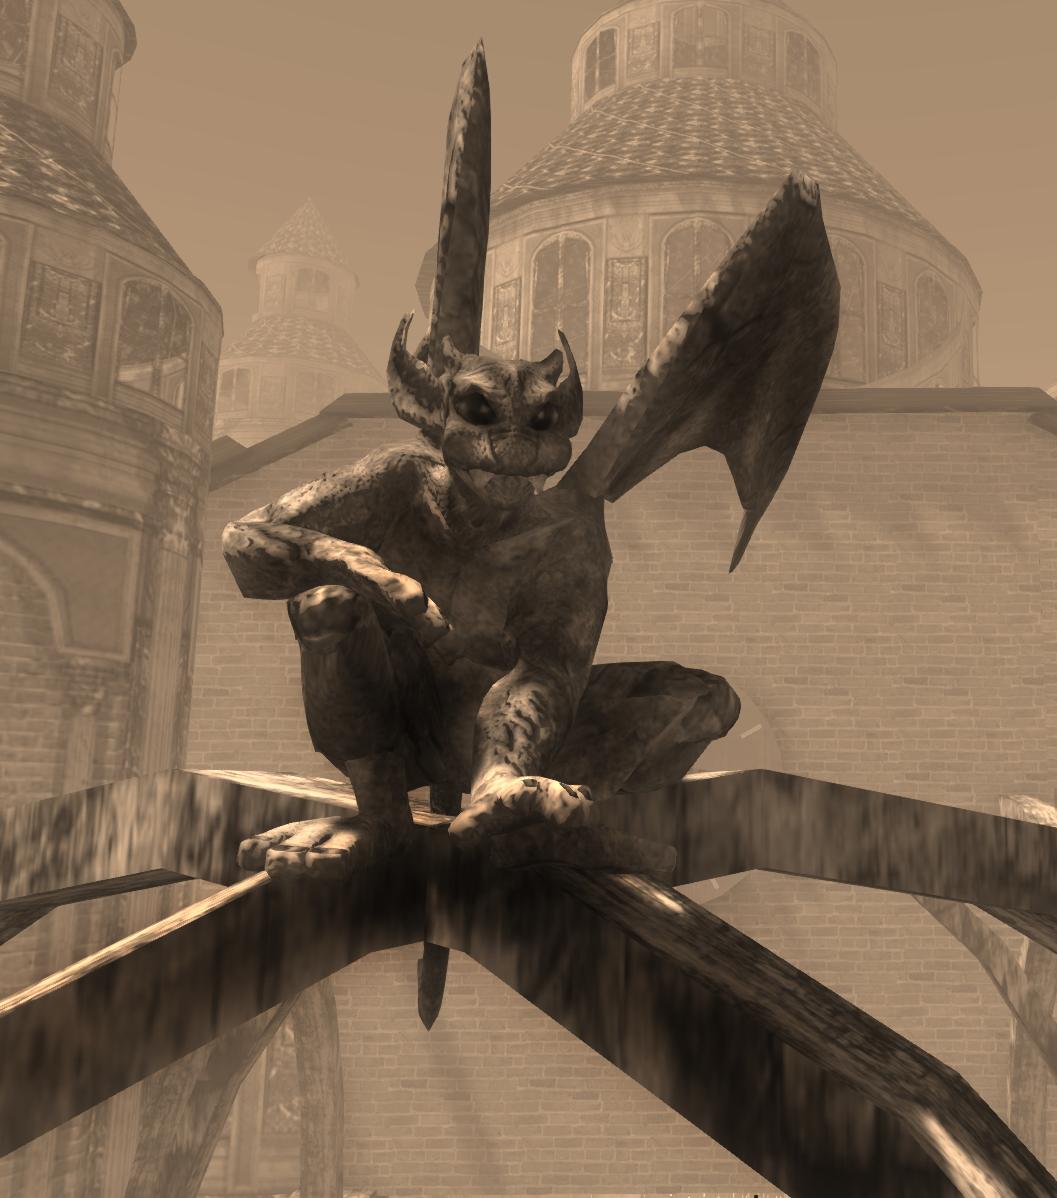 Avatar Bizarre Gargoyle Avatar Posing on Cathedral